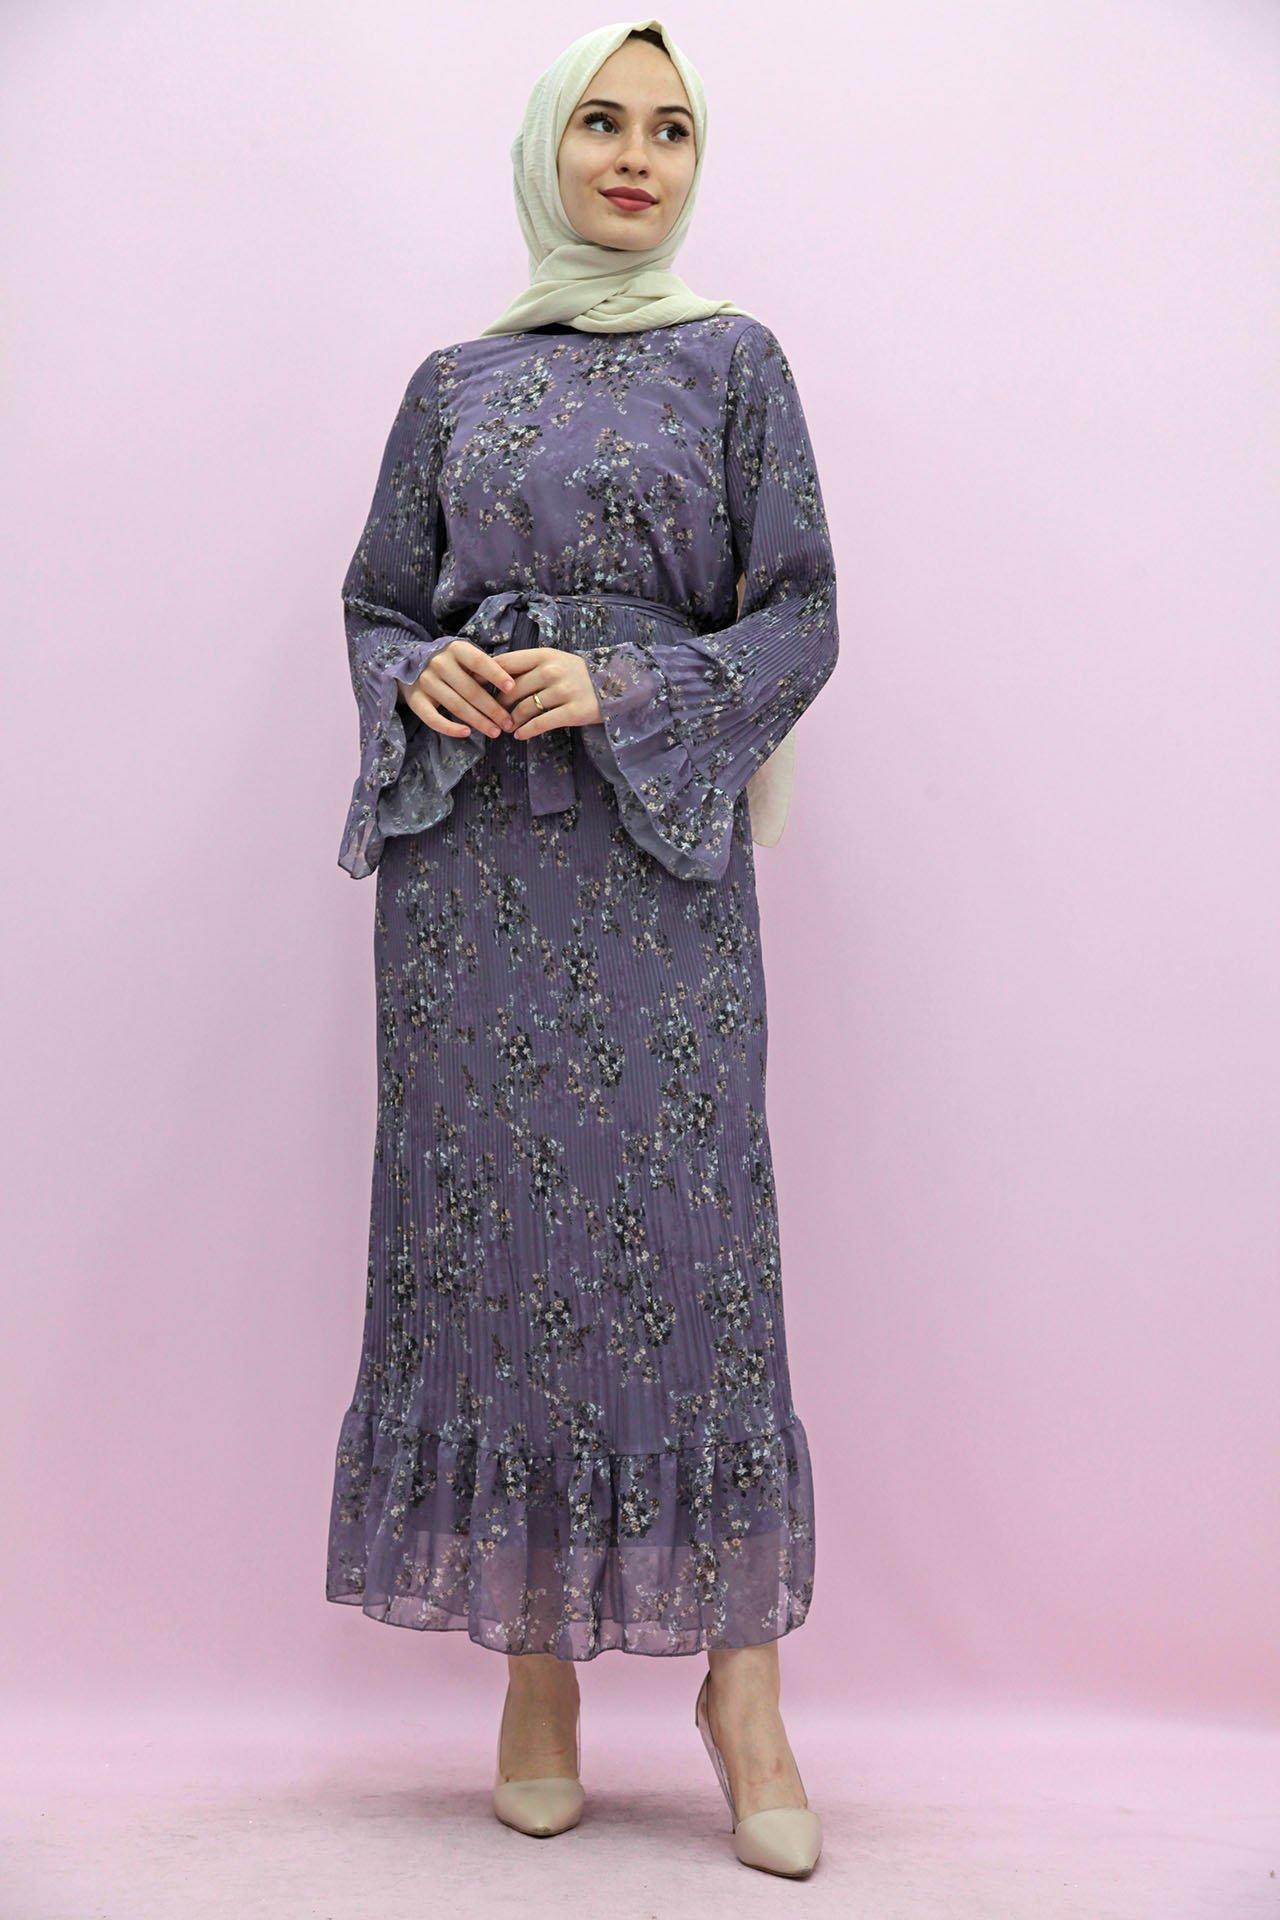 GİZAGİYİM - Giza Kol Ucu Volanlı Elbise Lila